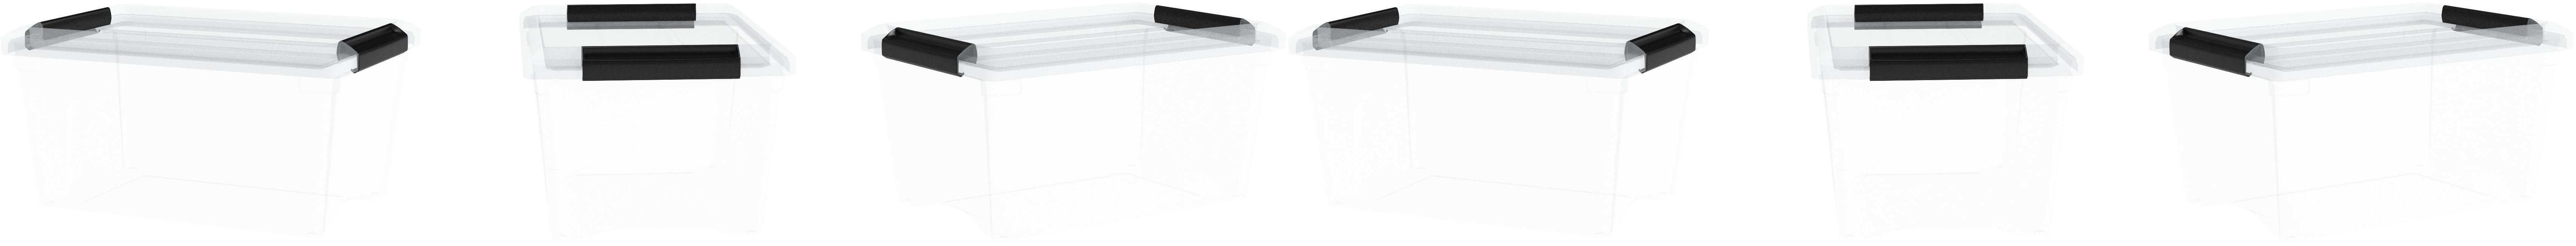 27 L wei/ß Iris Ohyama Box Chest NSBC-500 Set mit 3 stapelbaren Schubladen f/ür Aufbewahrung//K/üche//B/üro Polypropylene